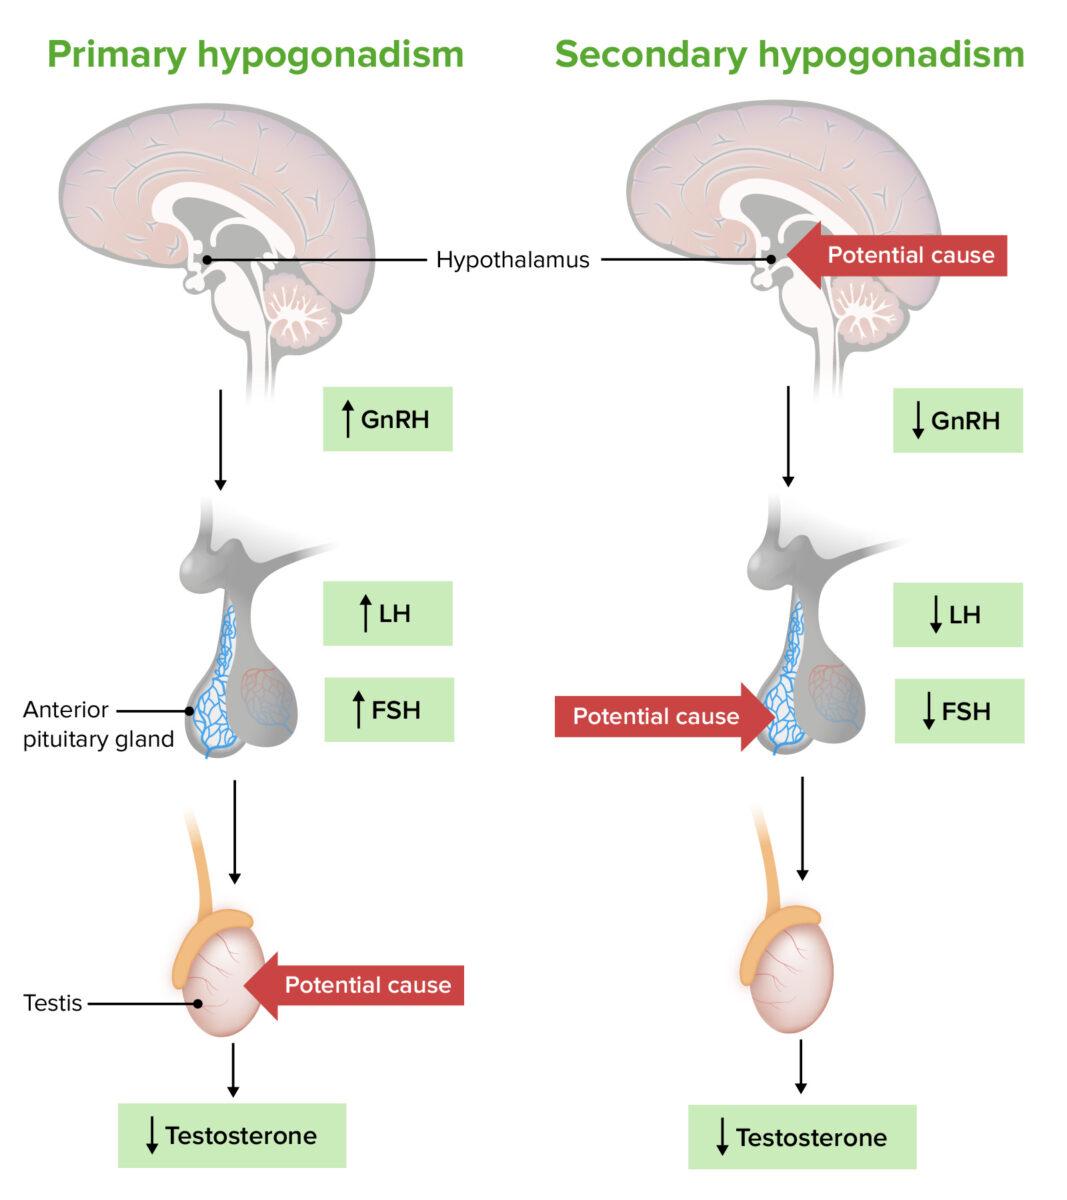 Pathogenesis of primary versus secondary hypogonadism